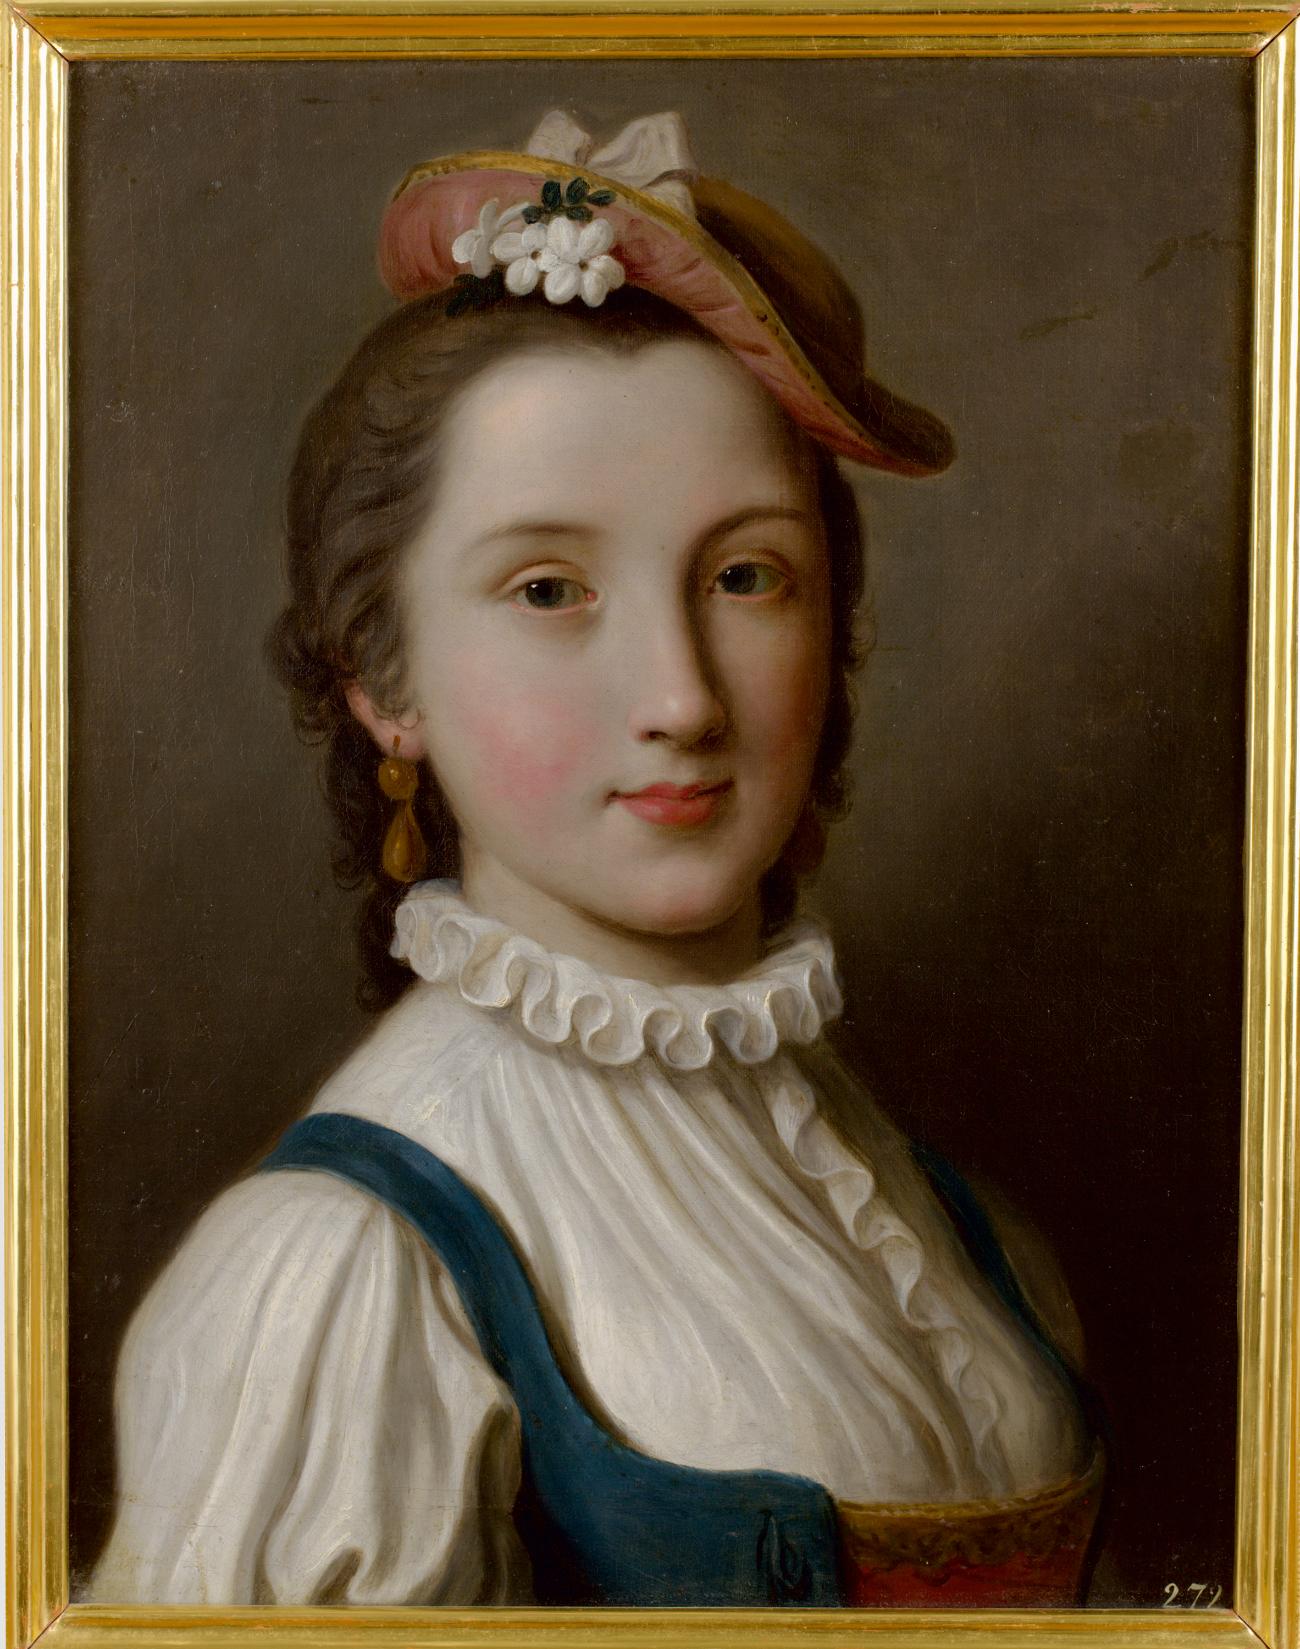 Pietro Antonio Rotari. Fanciulla con cappello. 1756-1762\n